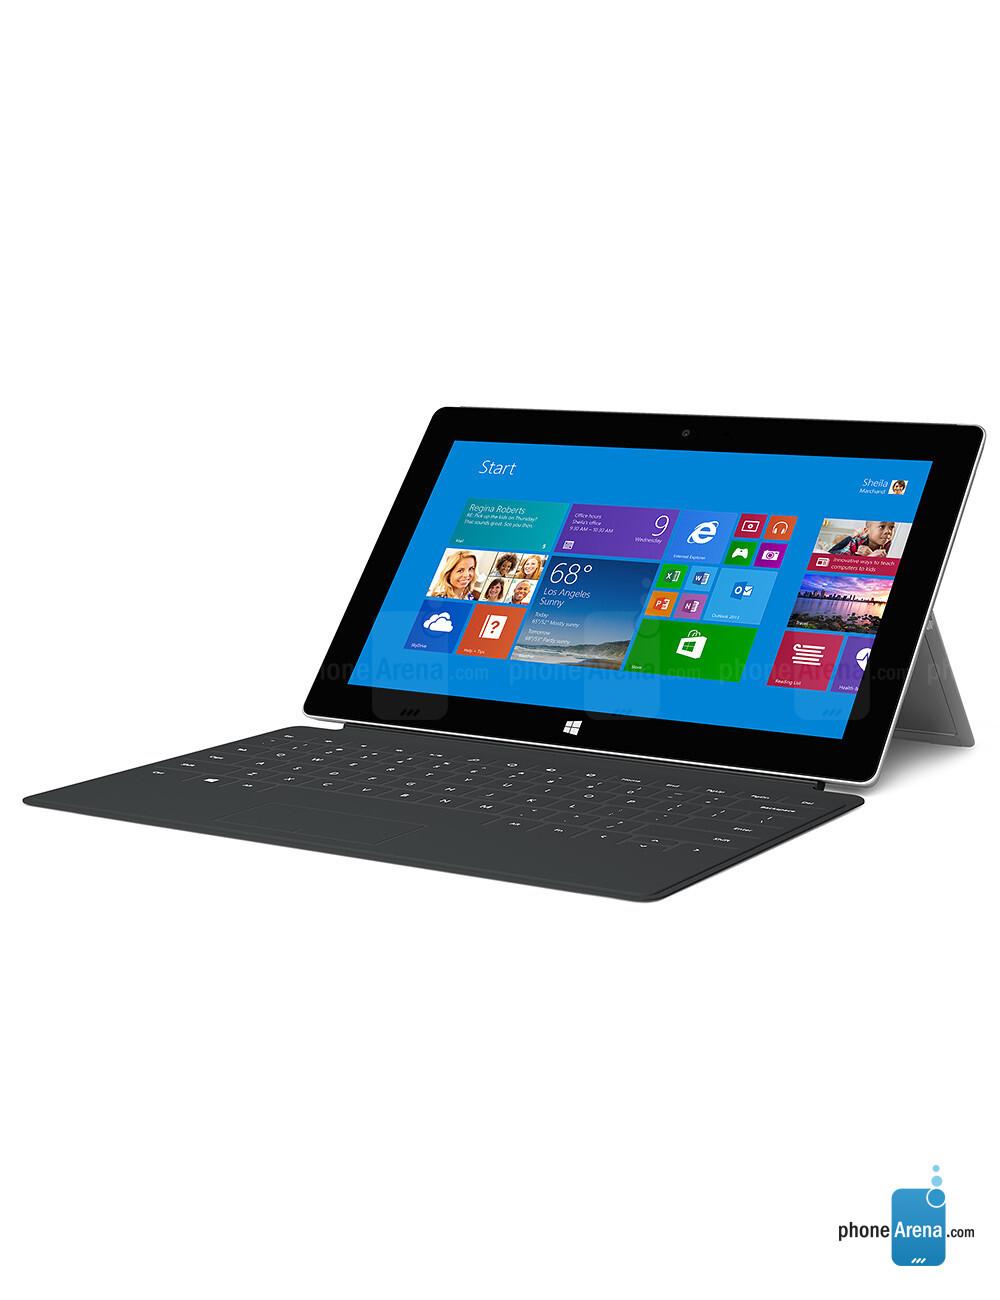 Microsoft surface 3 release date in Perth